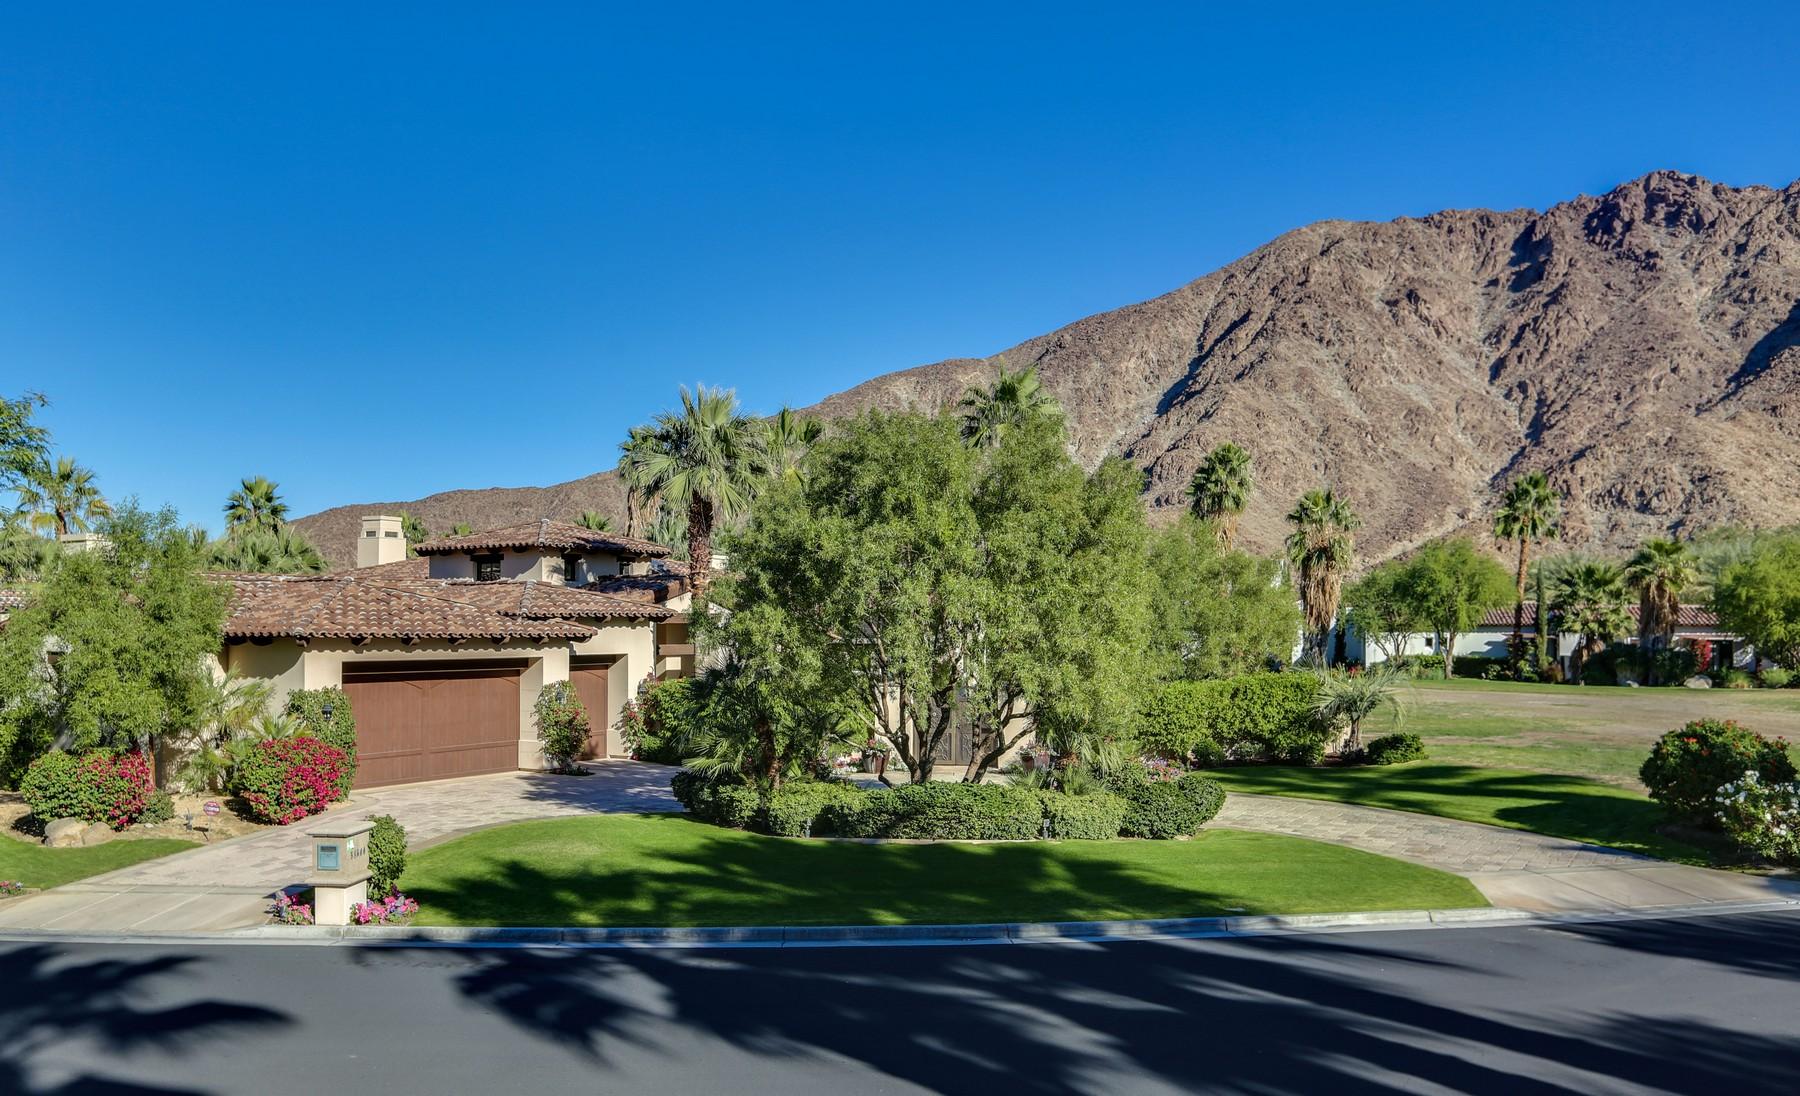 独户住宅 为 销售 在 53600 Del Gato Drive La Quinta, 加利福尼亚州, 92253 美国